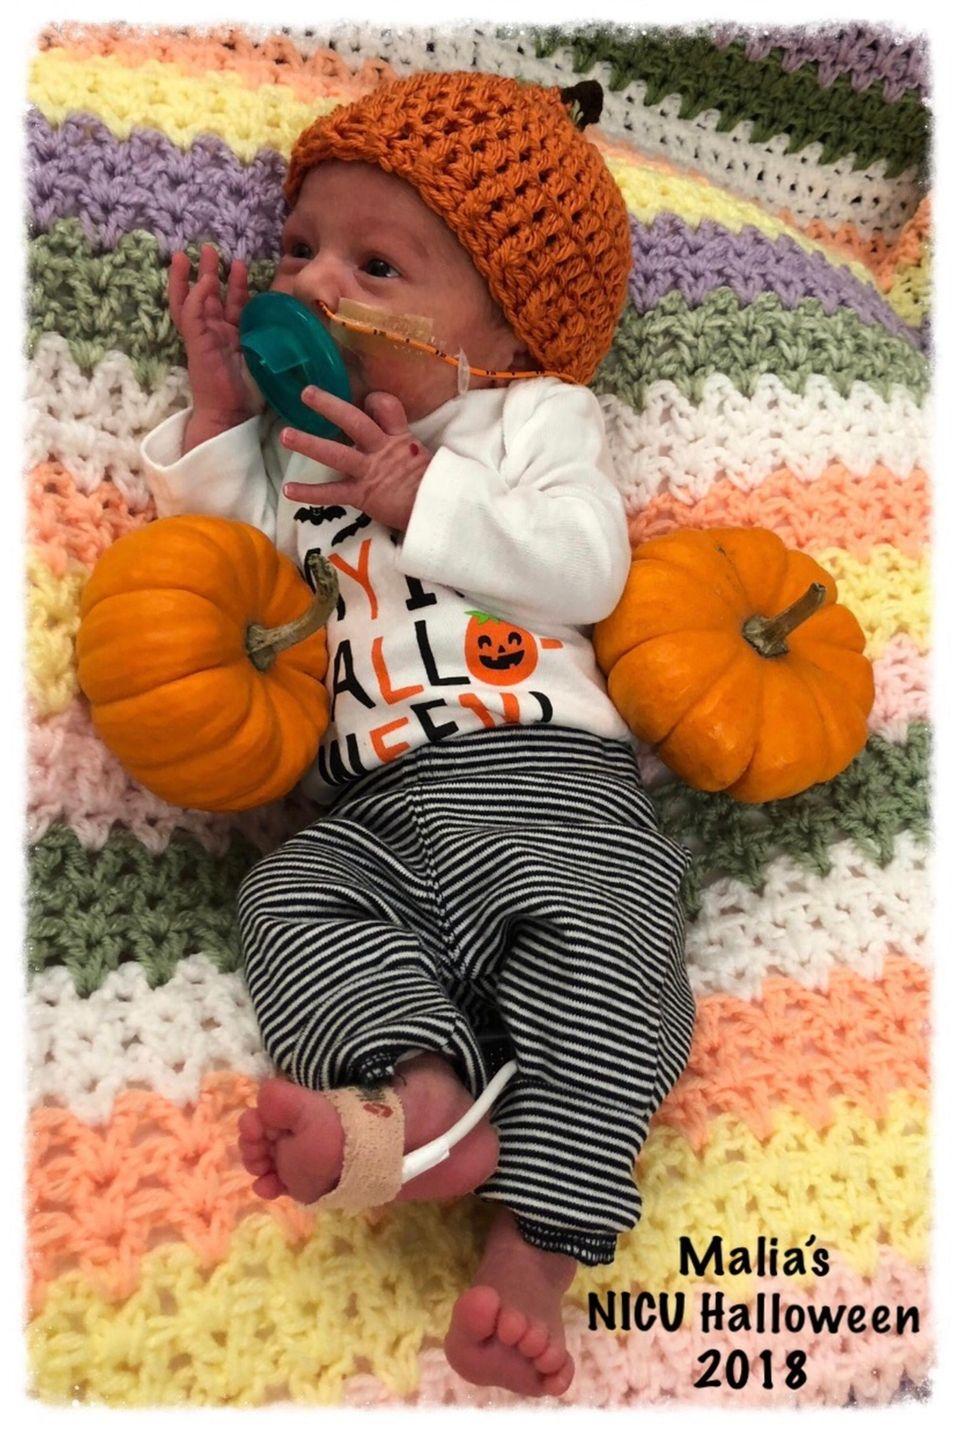 My daughter Malia was born two months premature